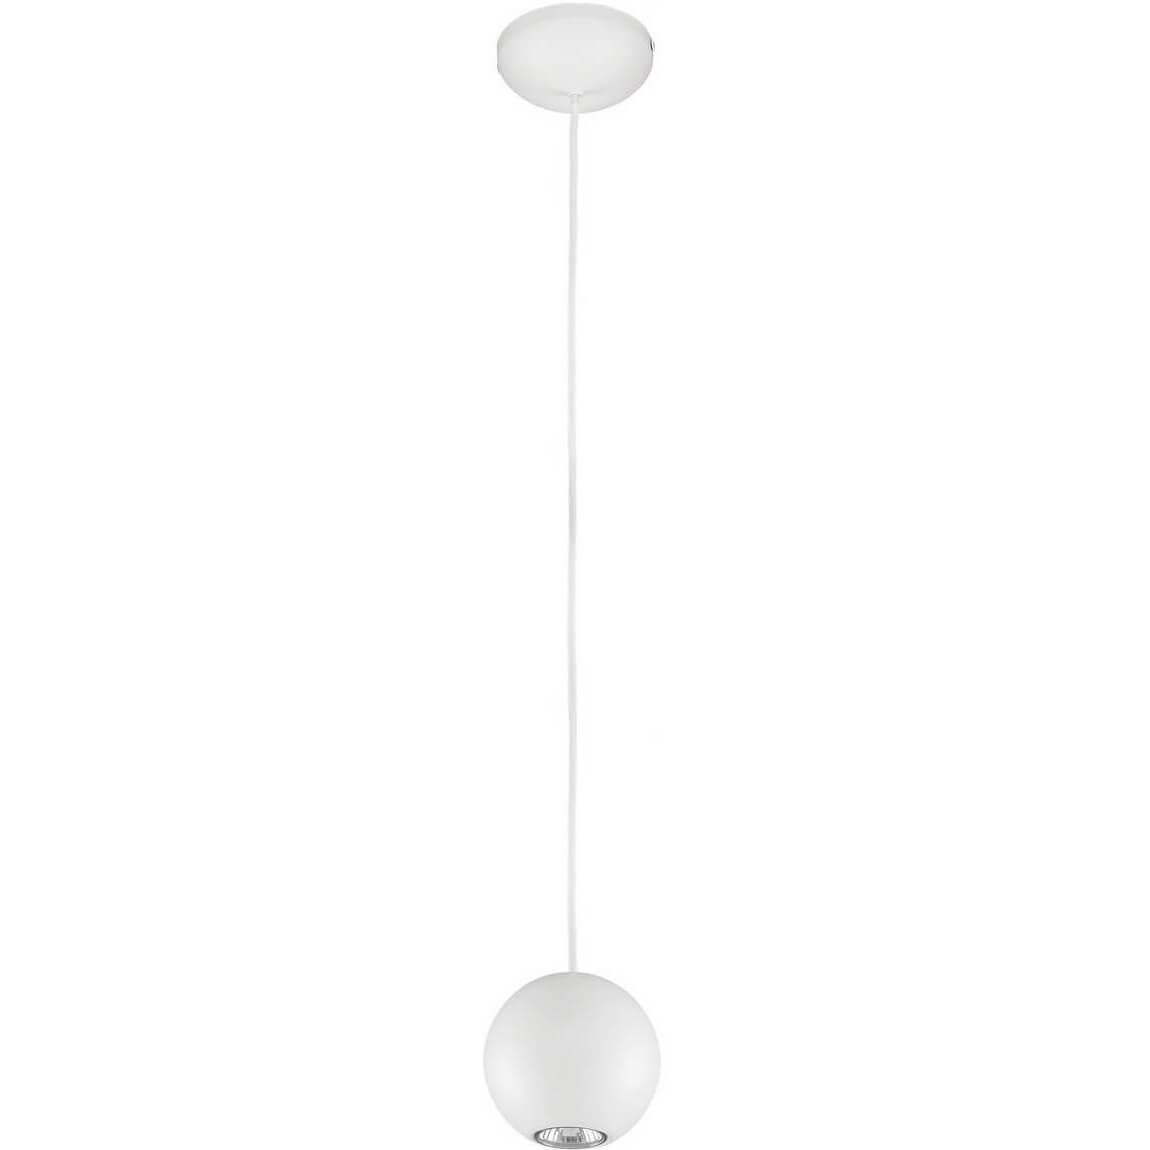 Подвесной светильник Nowodvorski Bubble 6142 nowodvorski bubble white i zwis